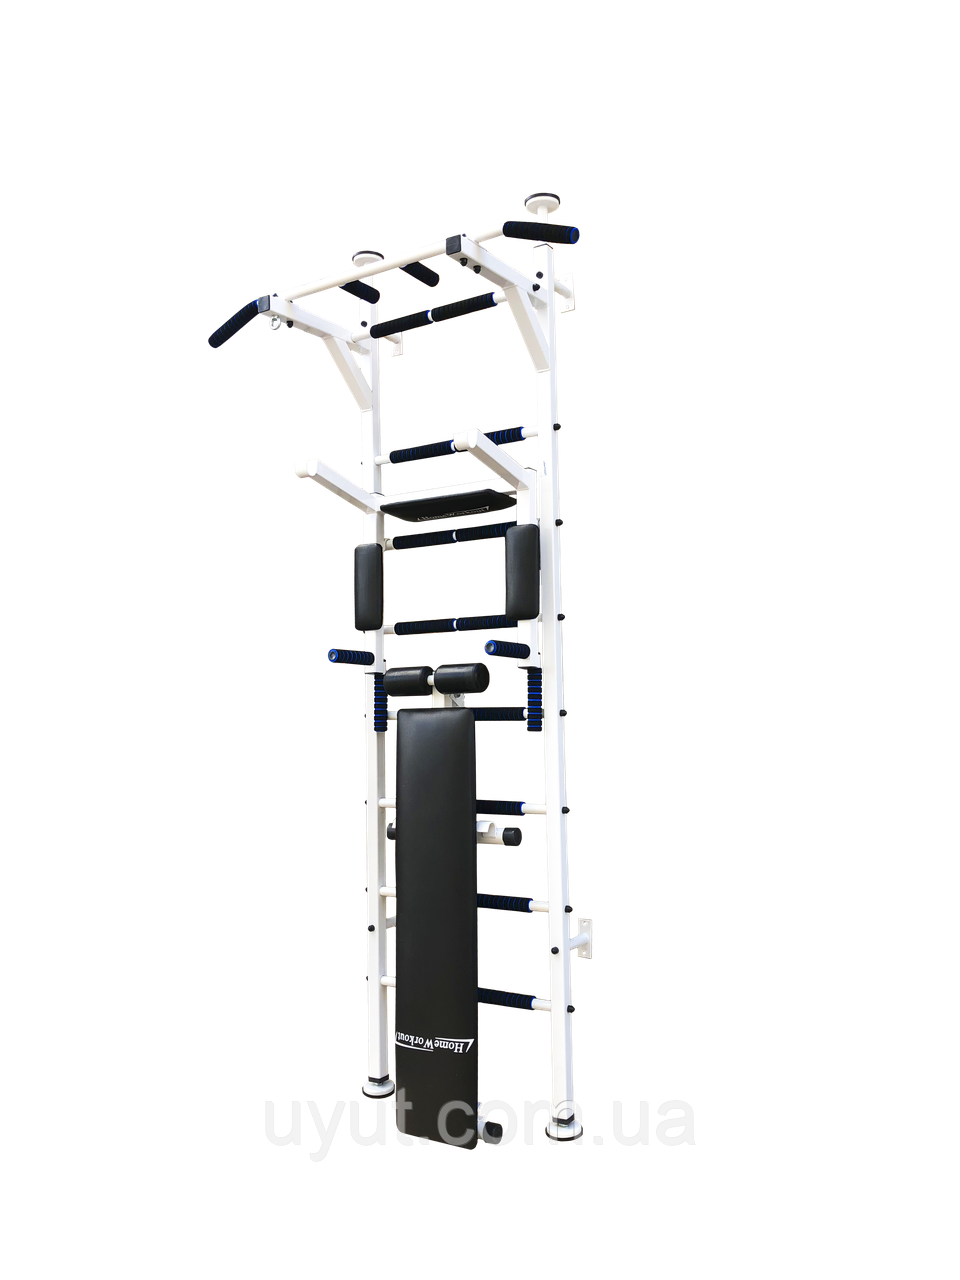 Шведская стенка усиленная «Fitness Pro Premium New ТМ Уют Спорт» (white)